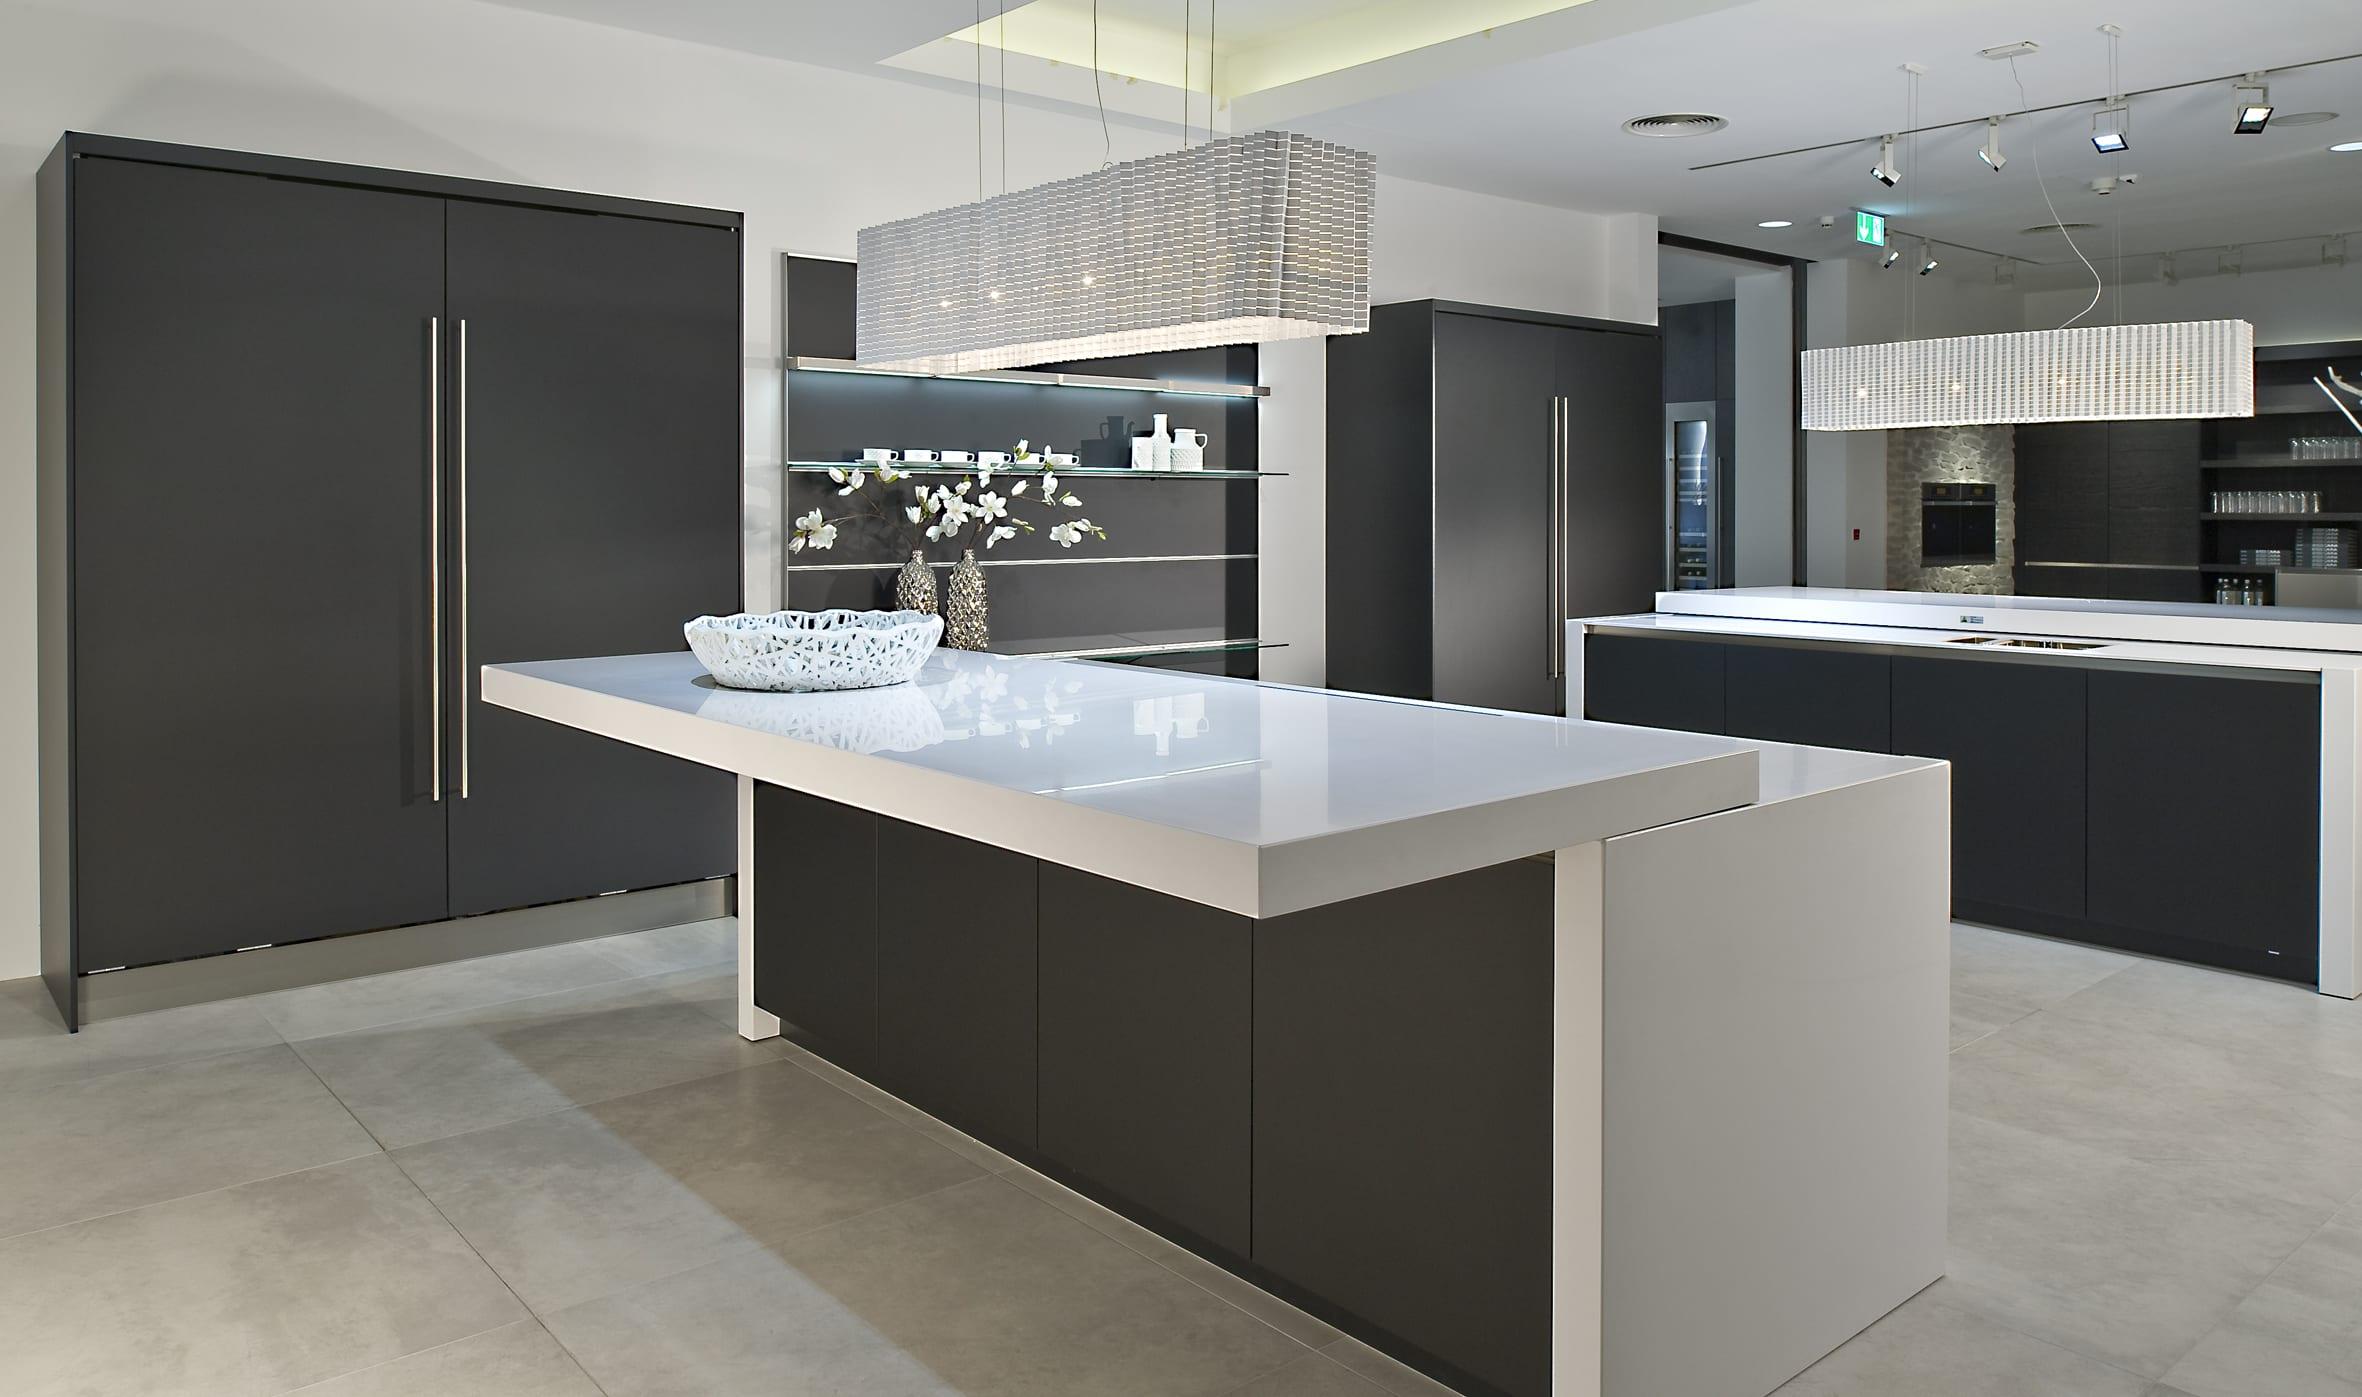 47 AV5095GL schwarz - Net Kitchens Direct, Walthamstow